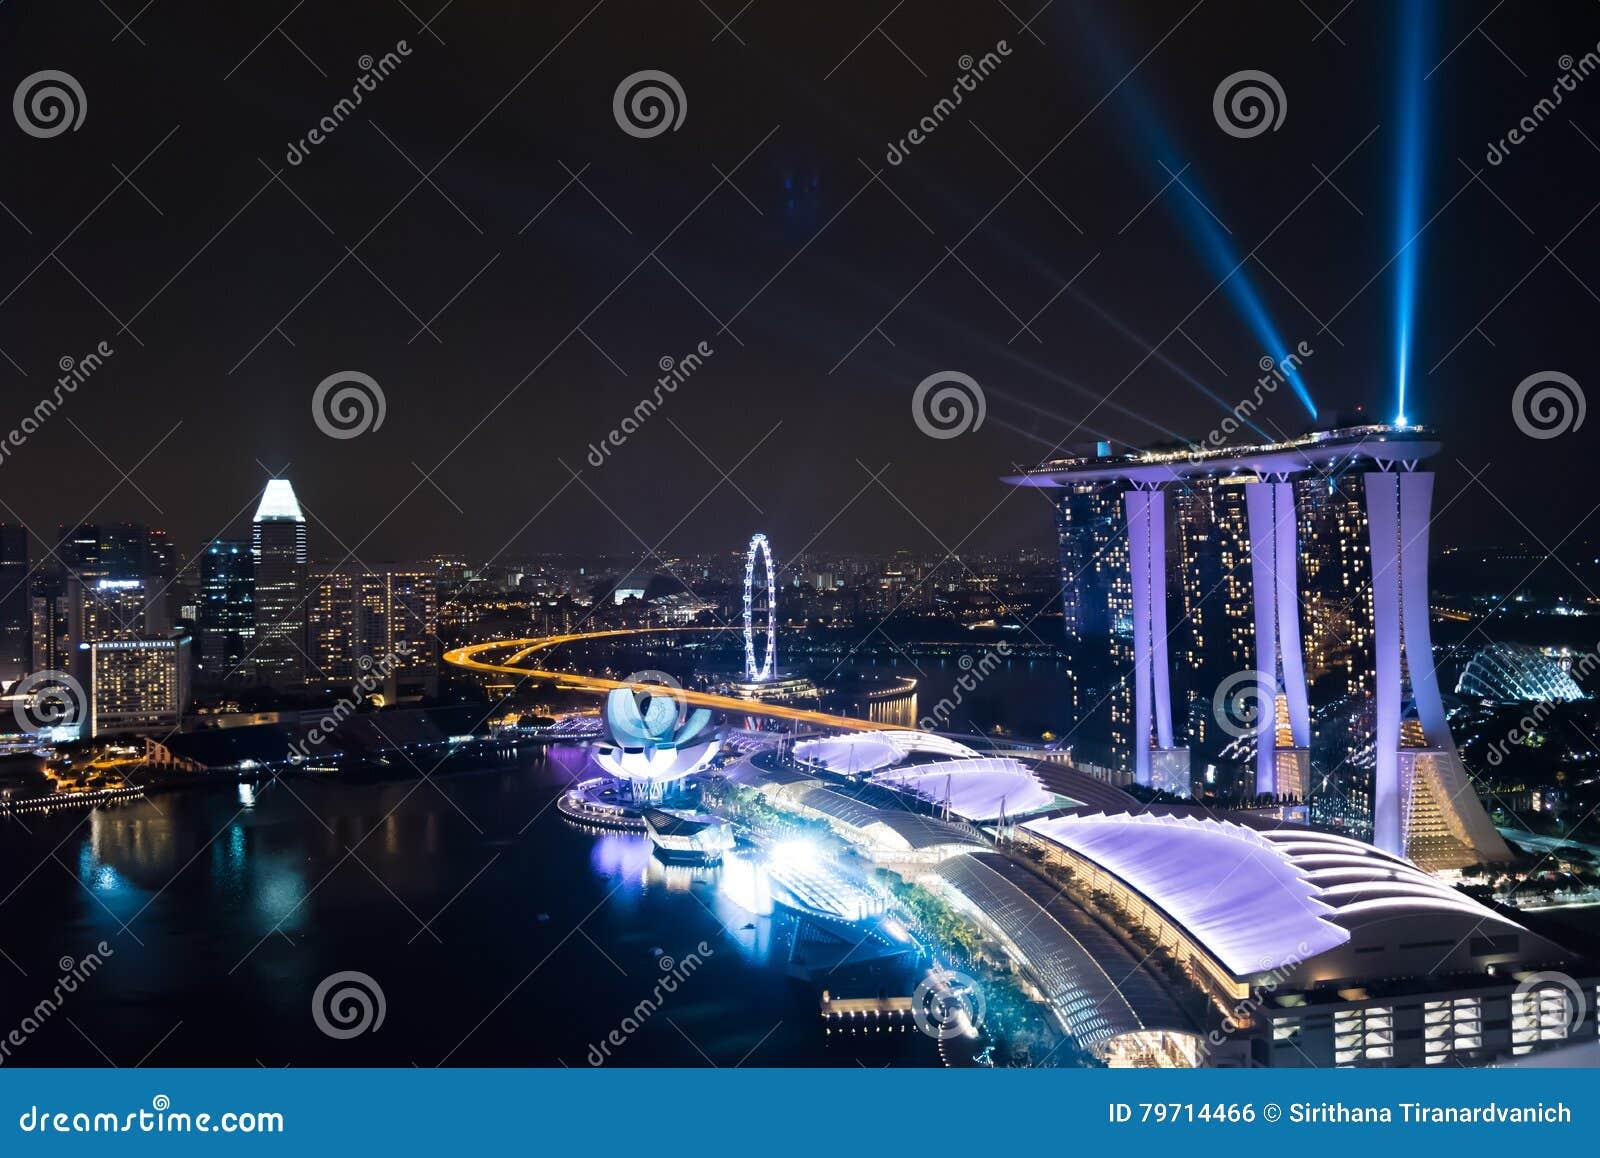 Aerial Asia Bay Full Largest Laser Light Marina Show